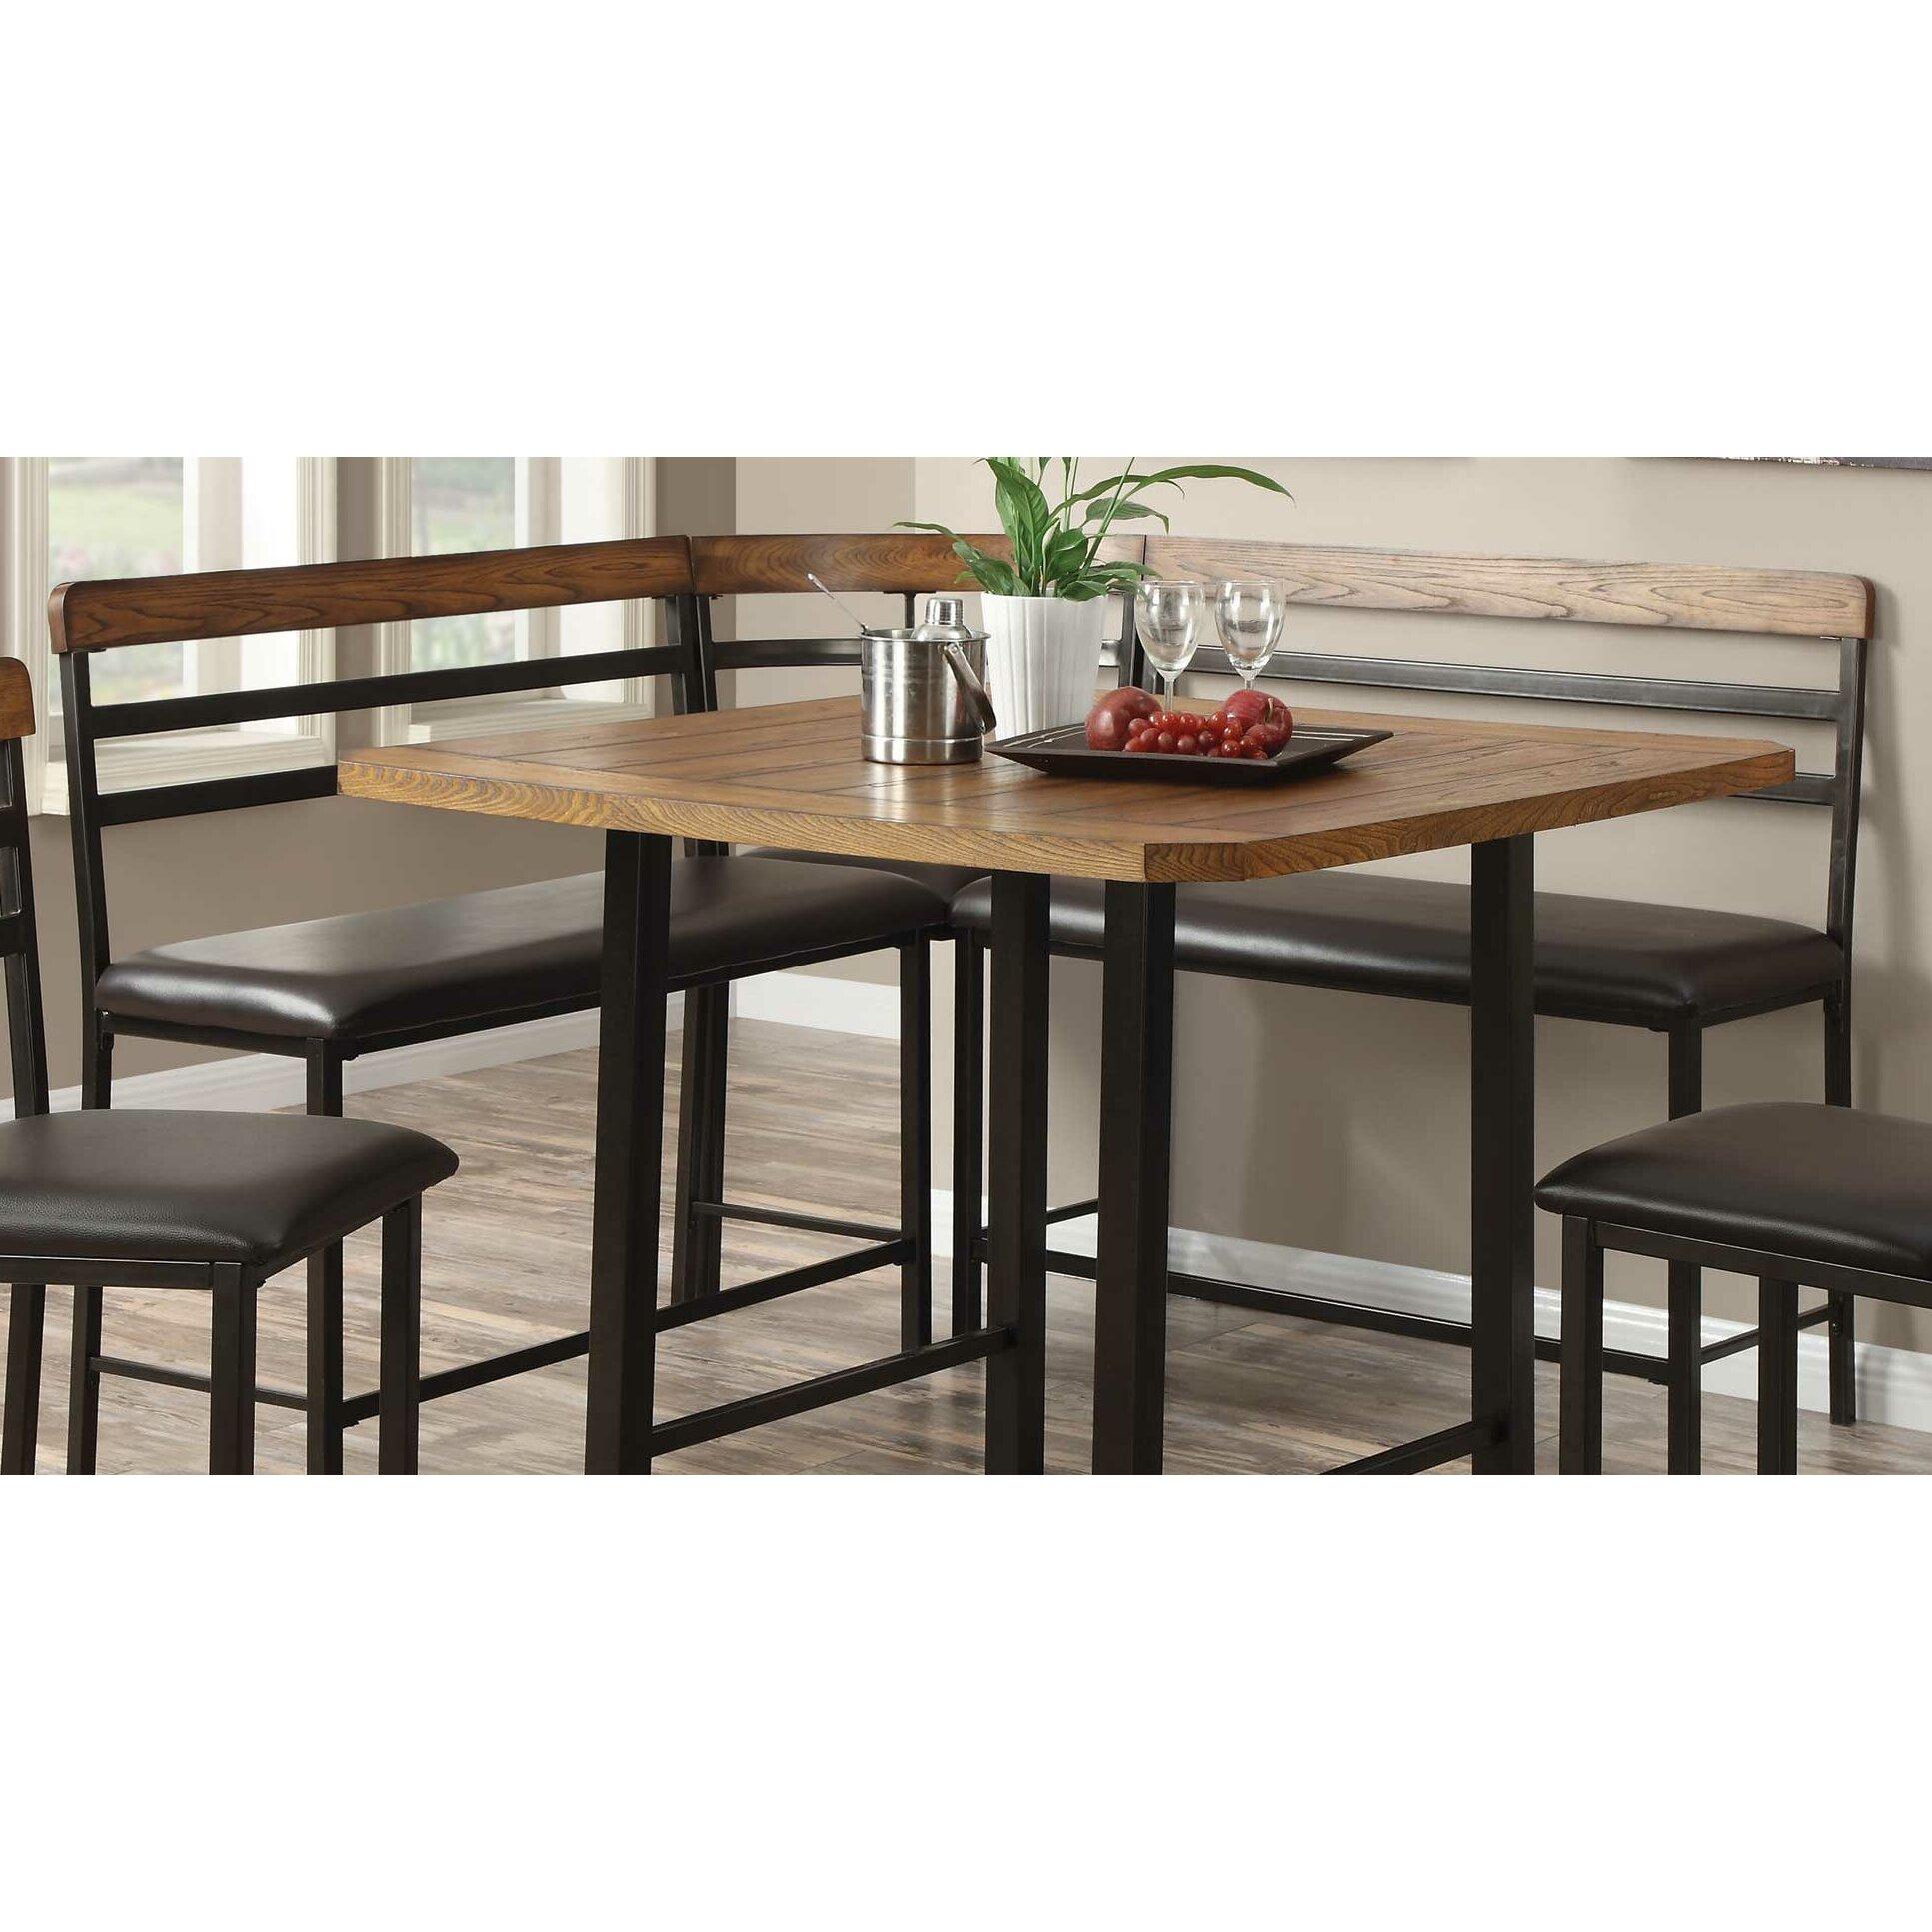 Wildon home sheldon 4 piece dining set reviews wayfair for 4 piece dining room set